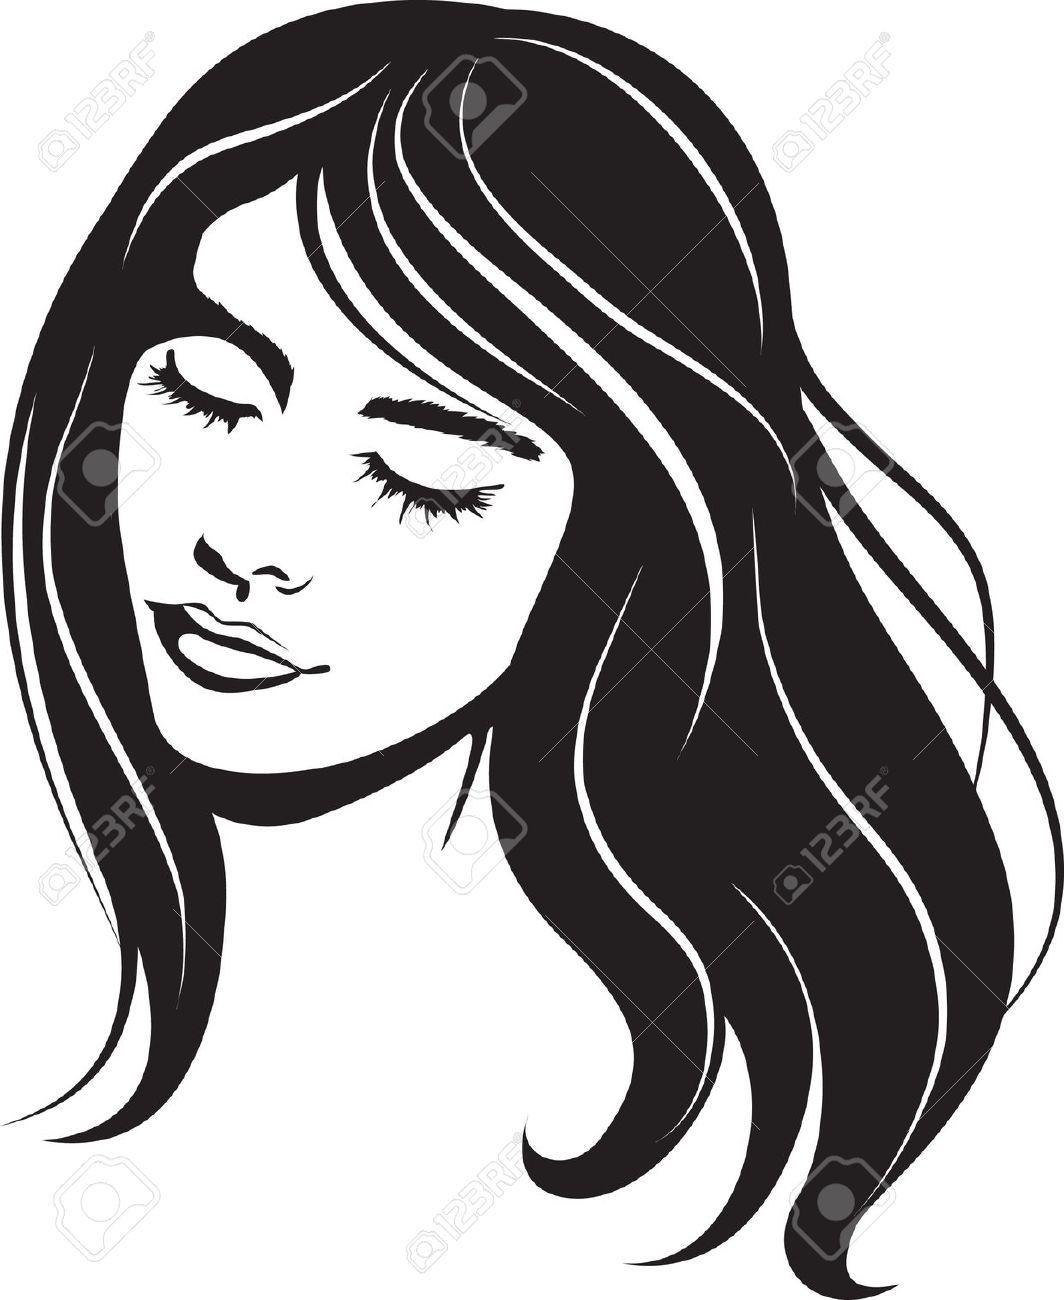 Beauty clipart beauty face. Vector girl portrait clip